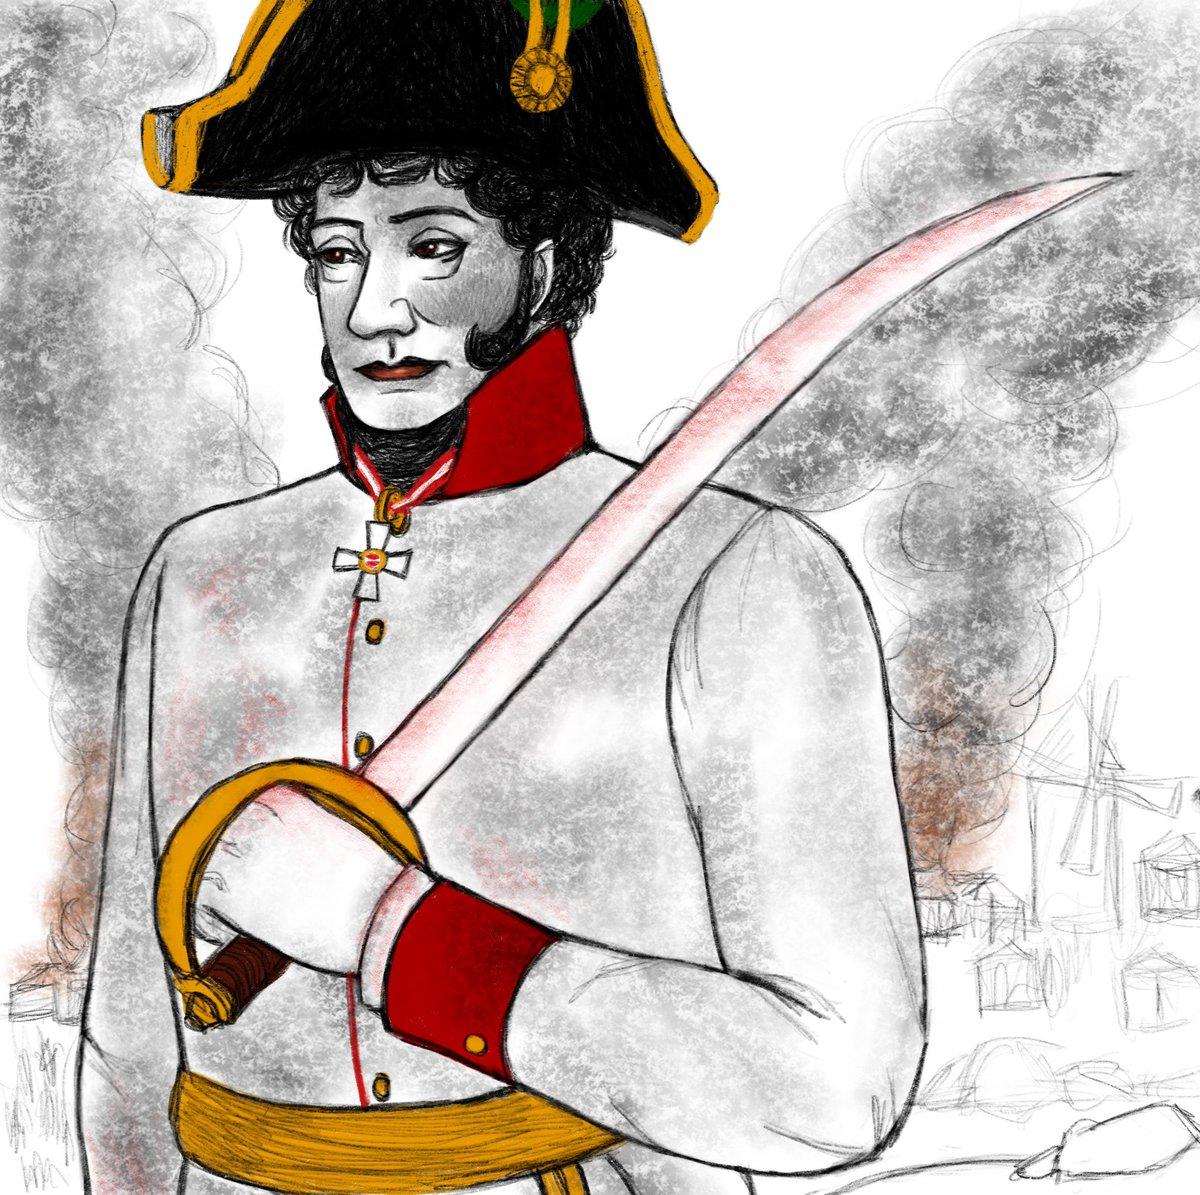 ✒️𝓐𝓷 𝓭𝓮𝓻 𝓚𝓻𝓮𝓾𝔃𝓾𝓷𝓰 🗡  #napoleonicwars #art_kavalergard https://t.co/1APGxgnMtb